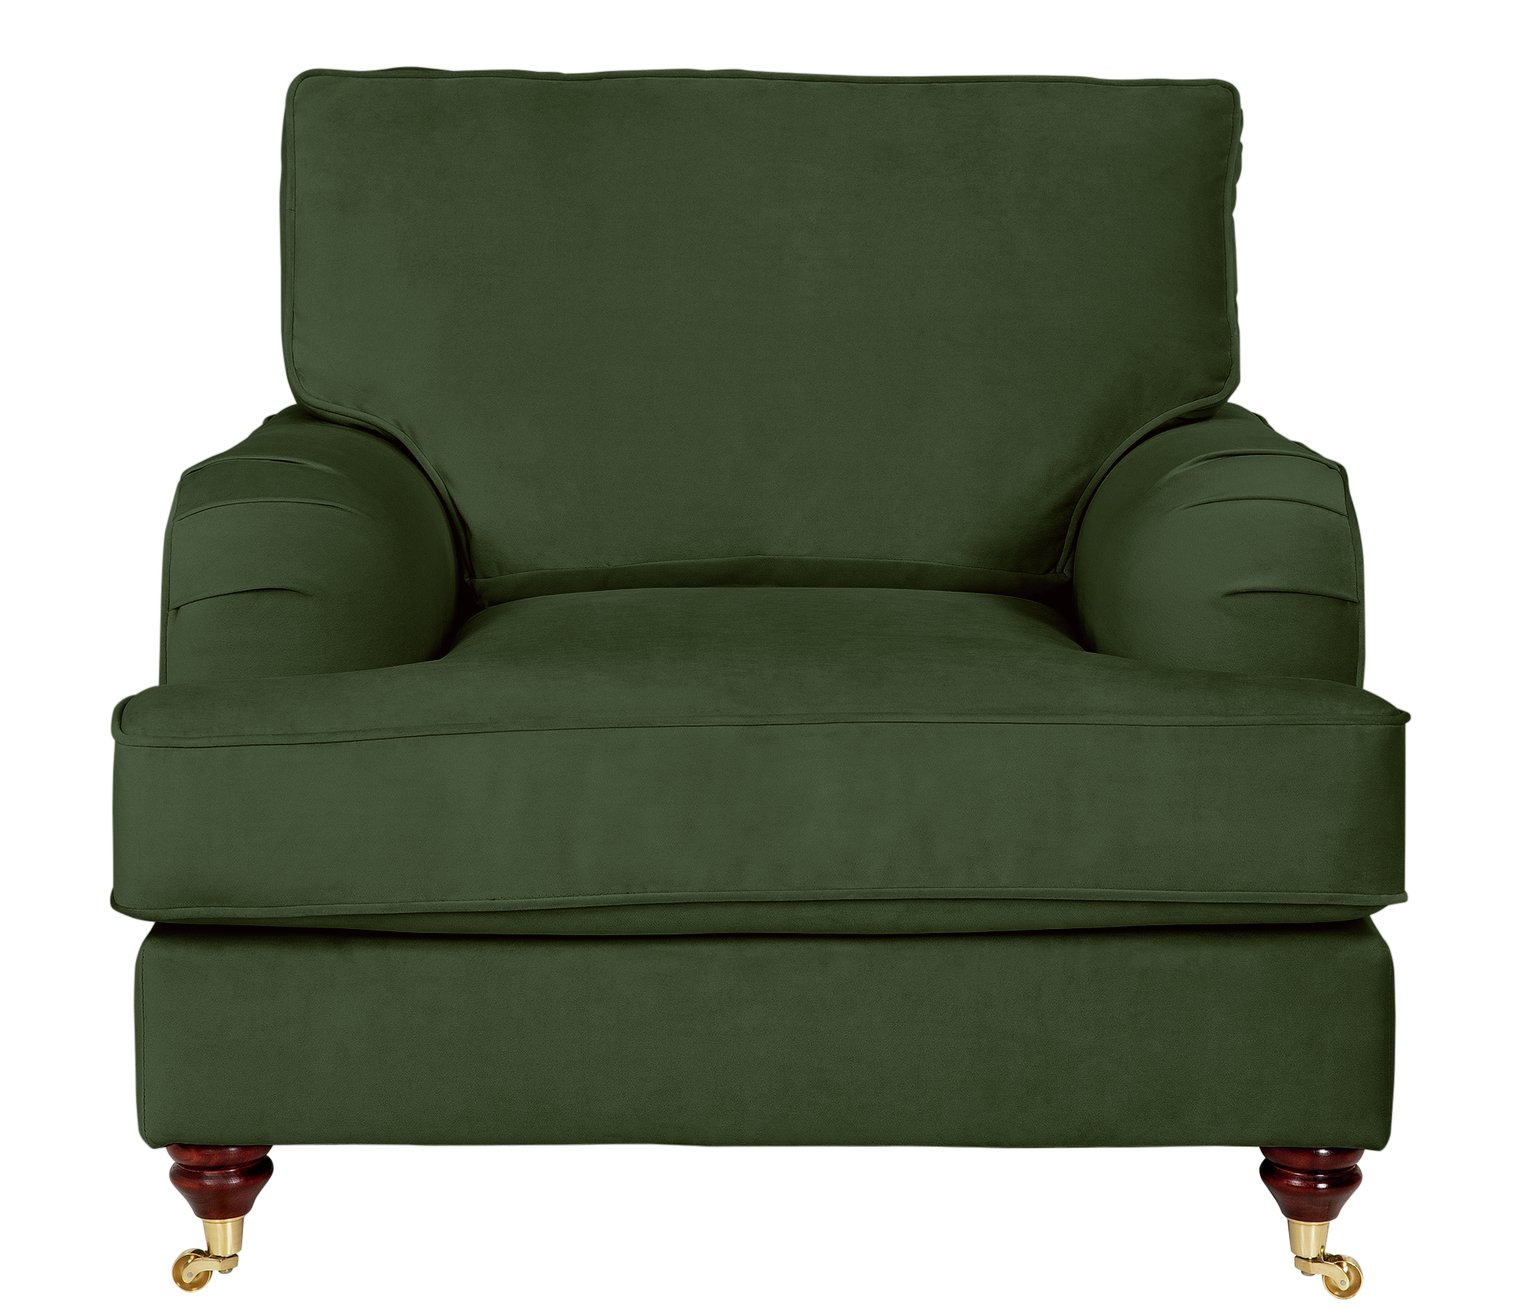 Argos Home Abberton Velvet Armchair - Green